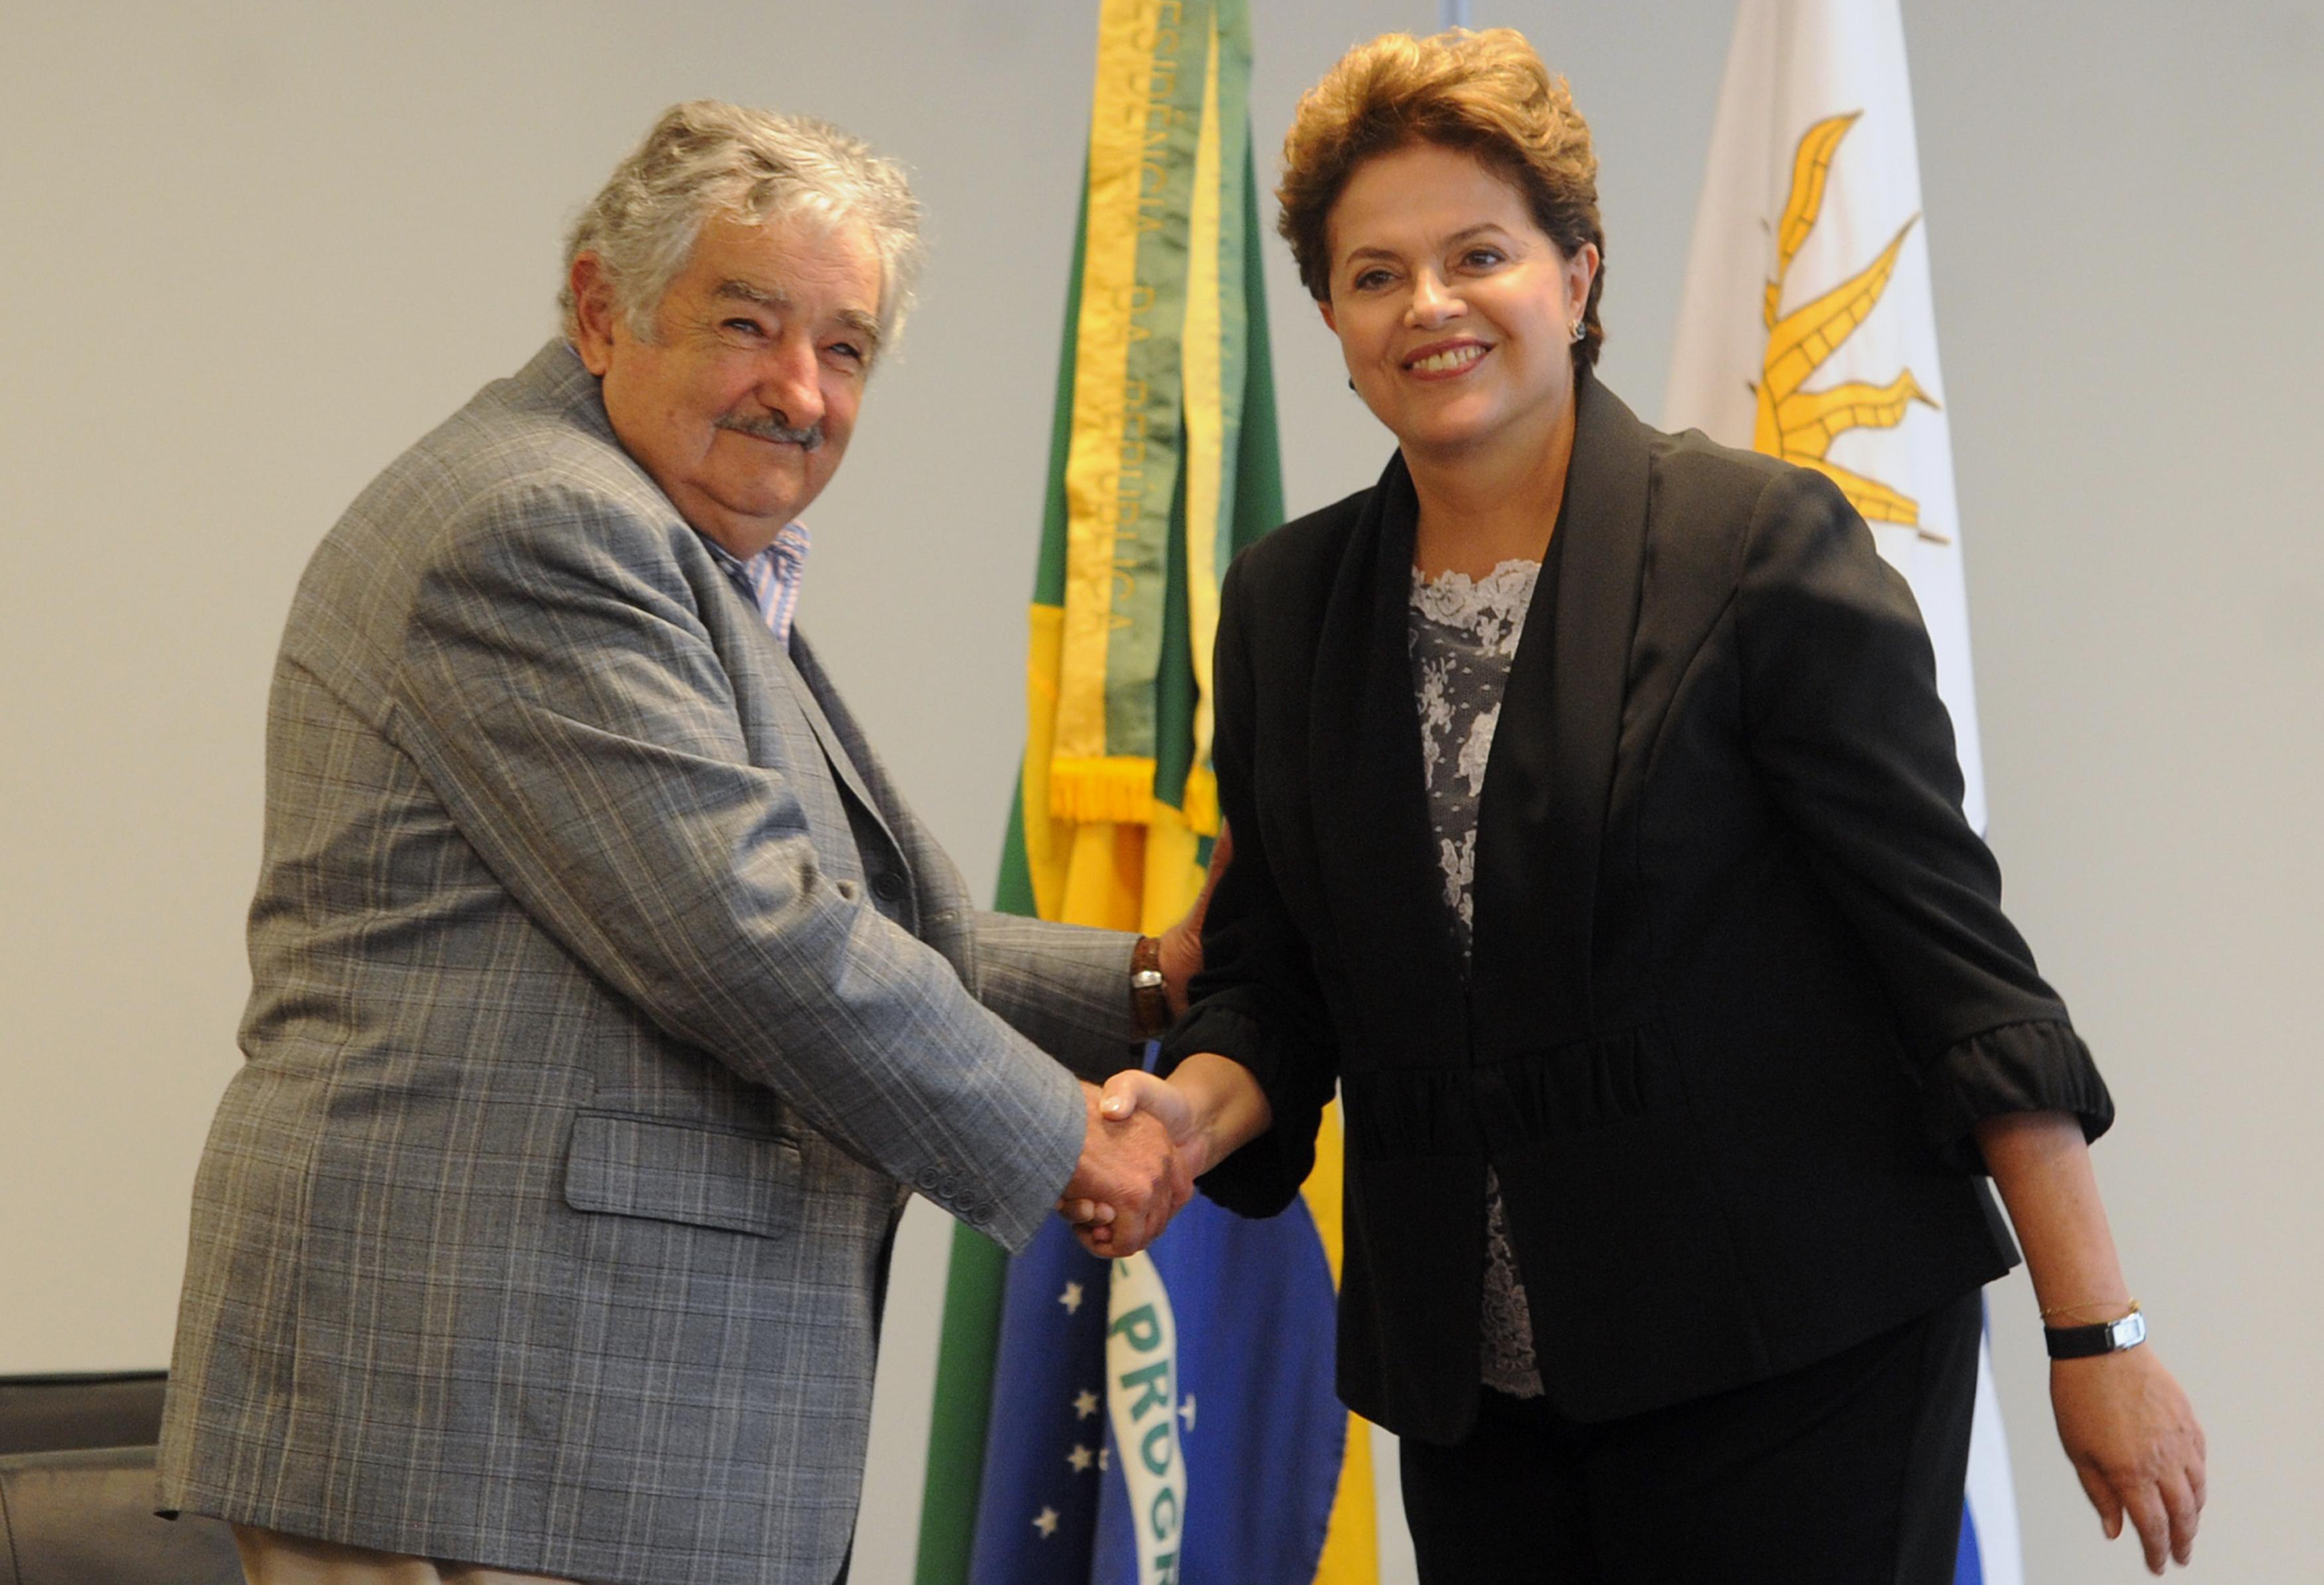 José Mujica with President of Brazil, Dilma Rouseff in 2011.